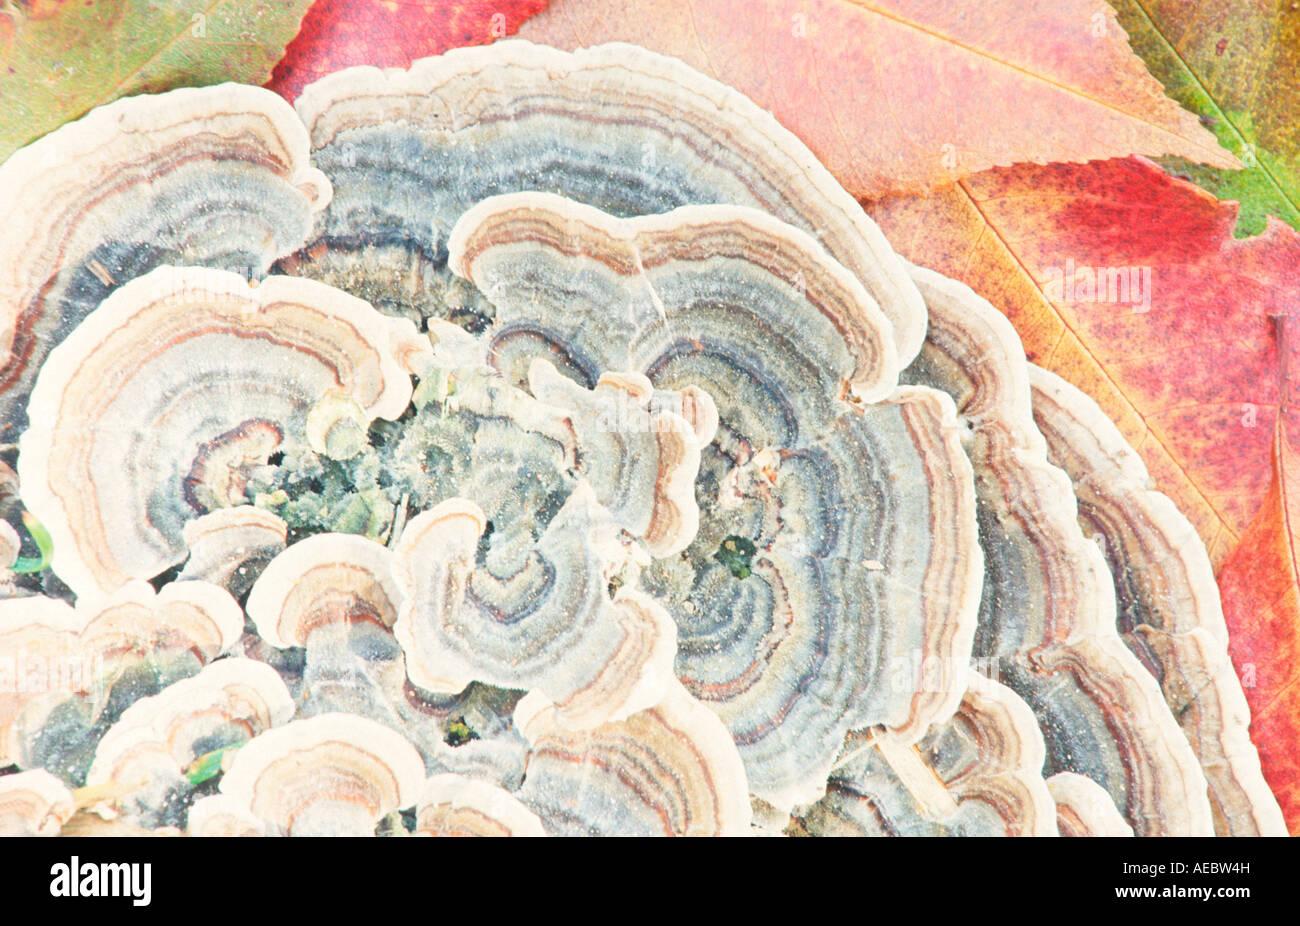 La Turquie mushroom Edgartown MA Photo Stock